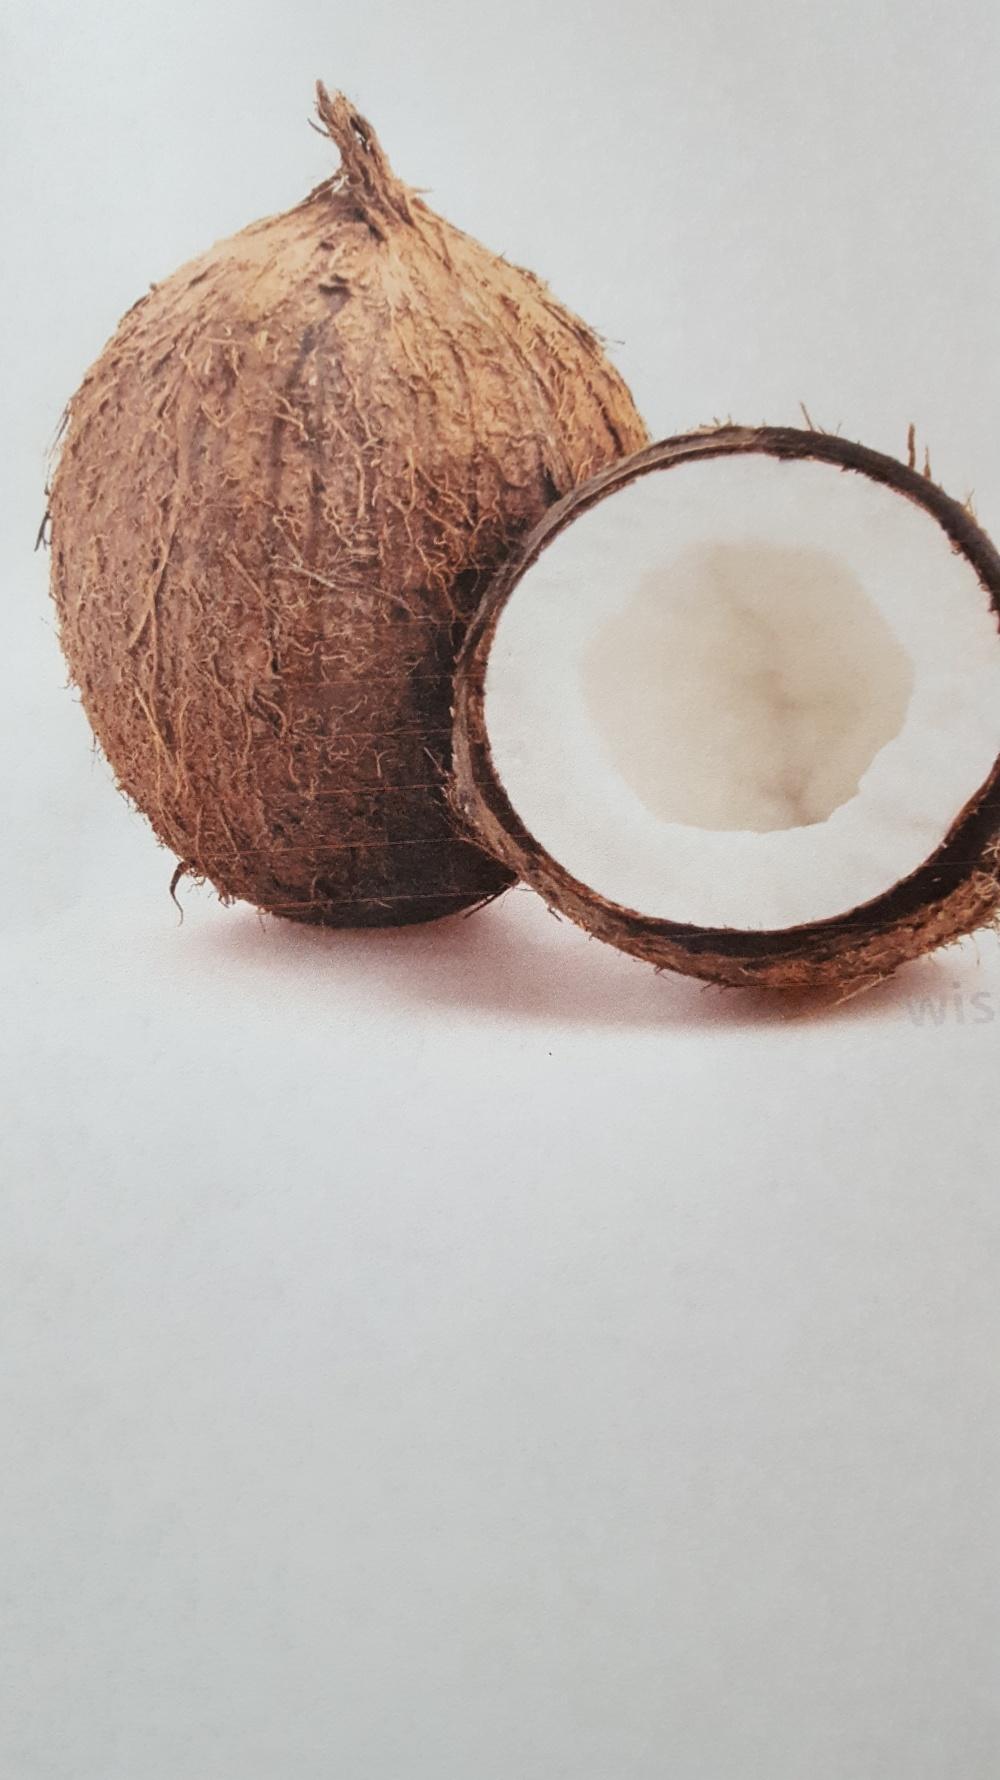 20180109_134841 coconut